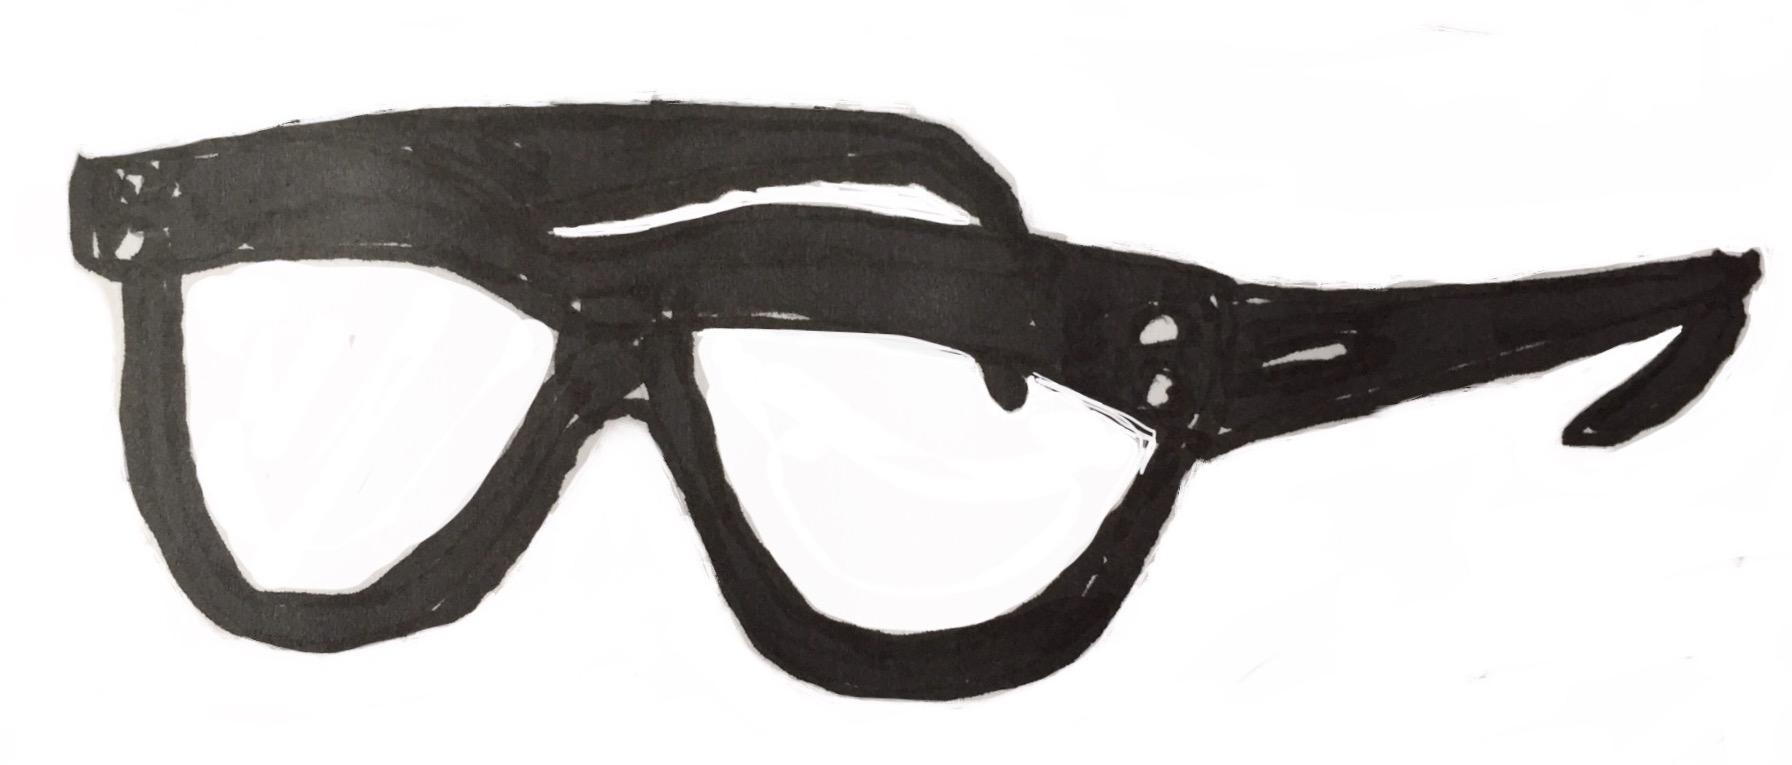 Walter Cronkite Glasses